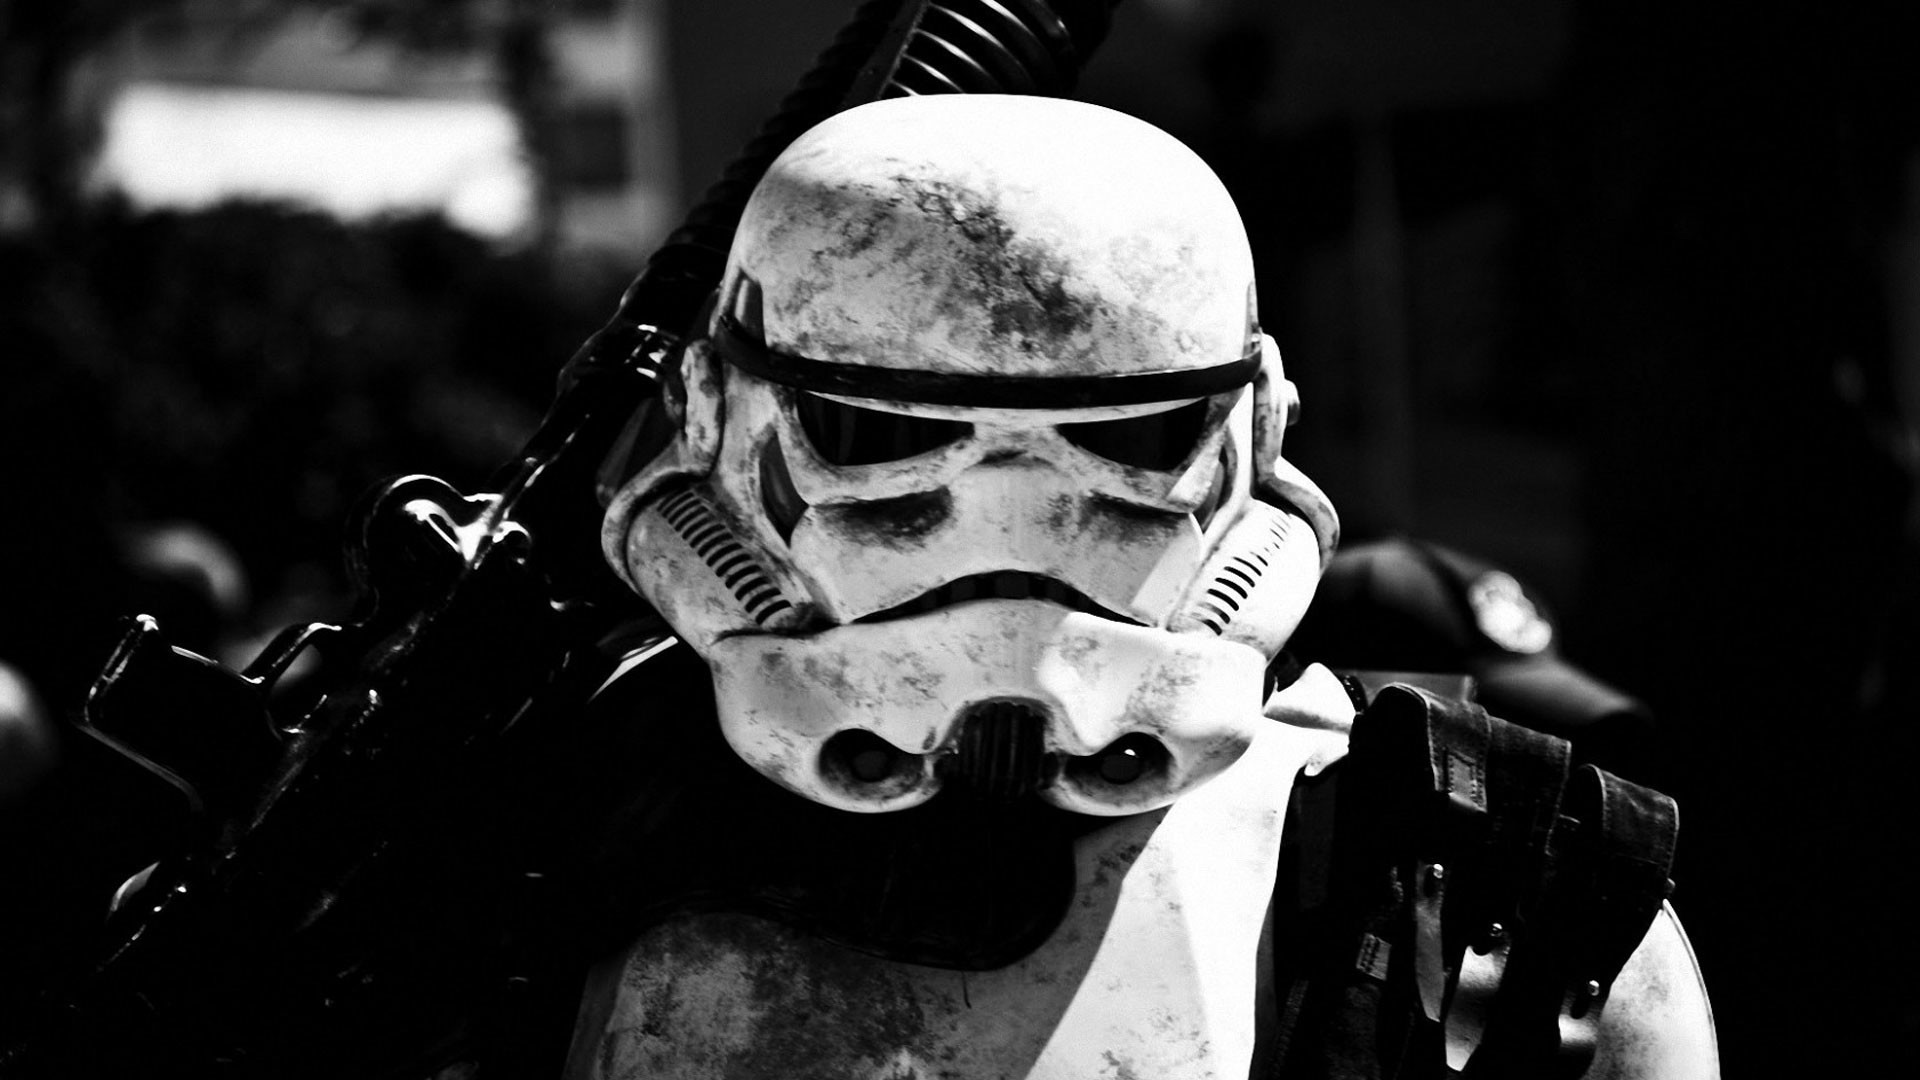 wars, helmet, dark Wallpaper, HD Wallpapers, Full HD 1080p .